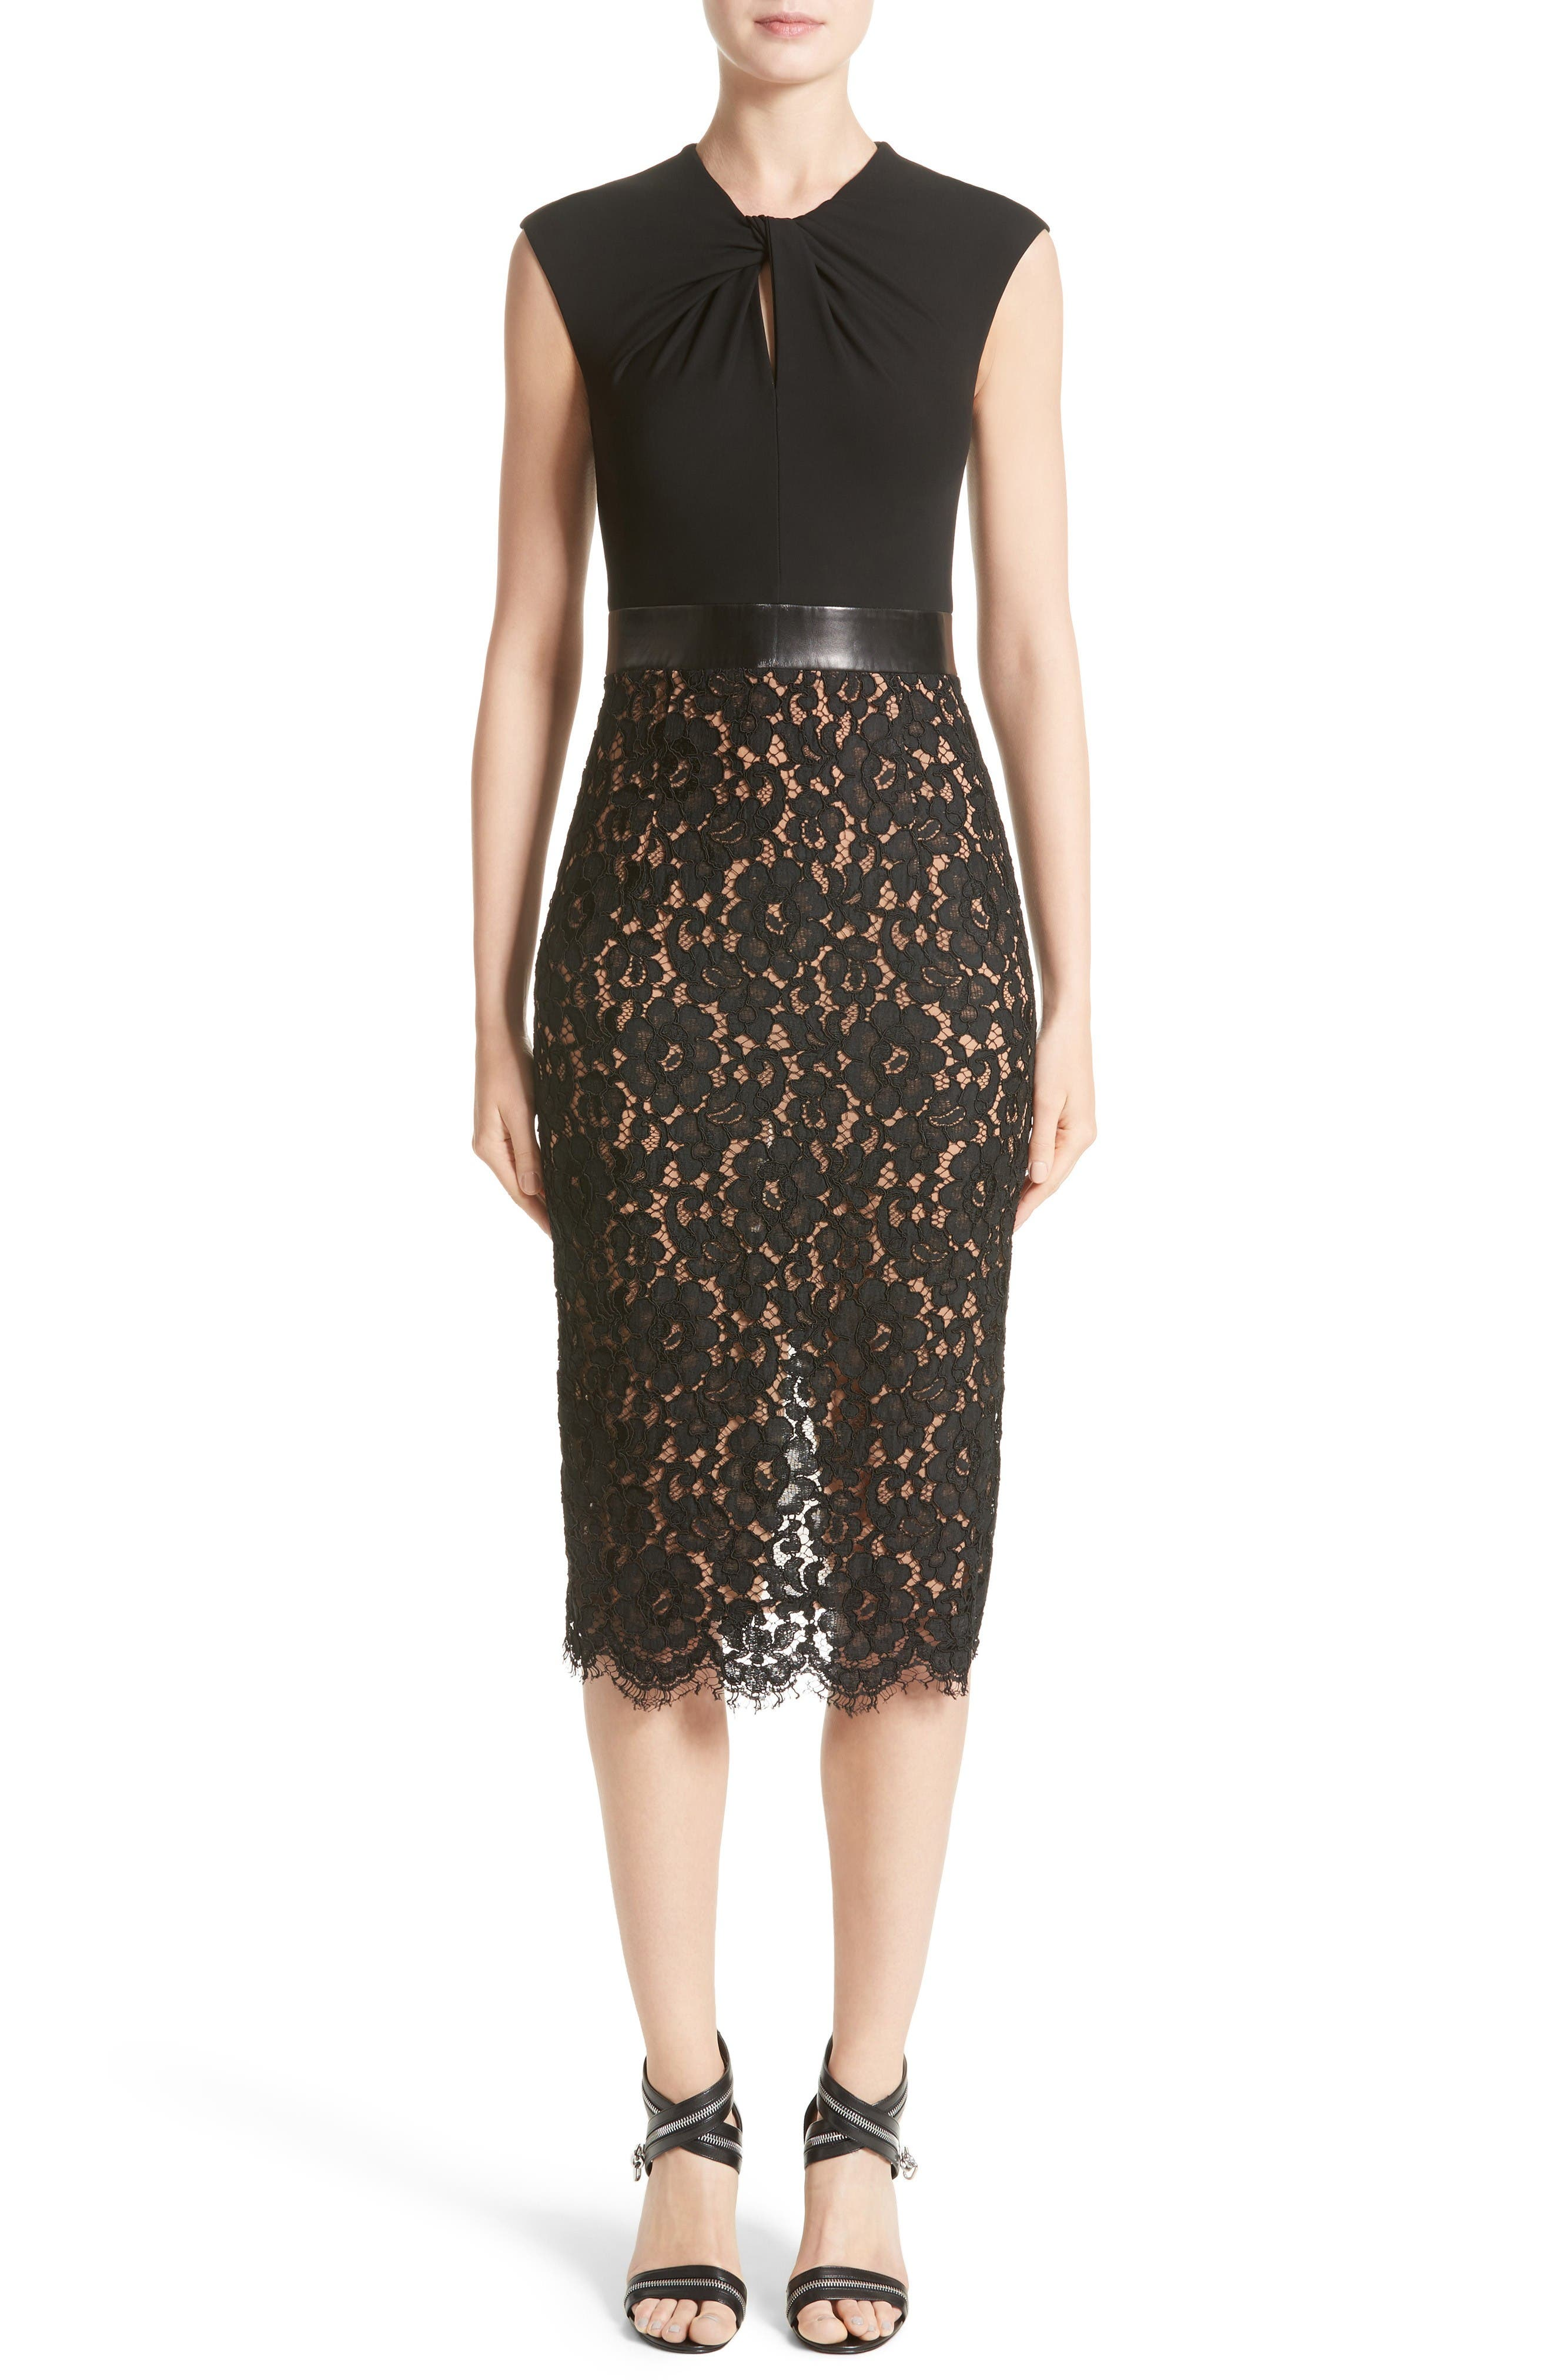 Alternate Image 1 Selected - Michael Kors Leather Trim Jersey & Lace Sheath Dress